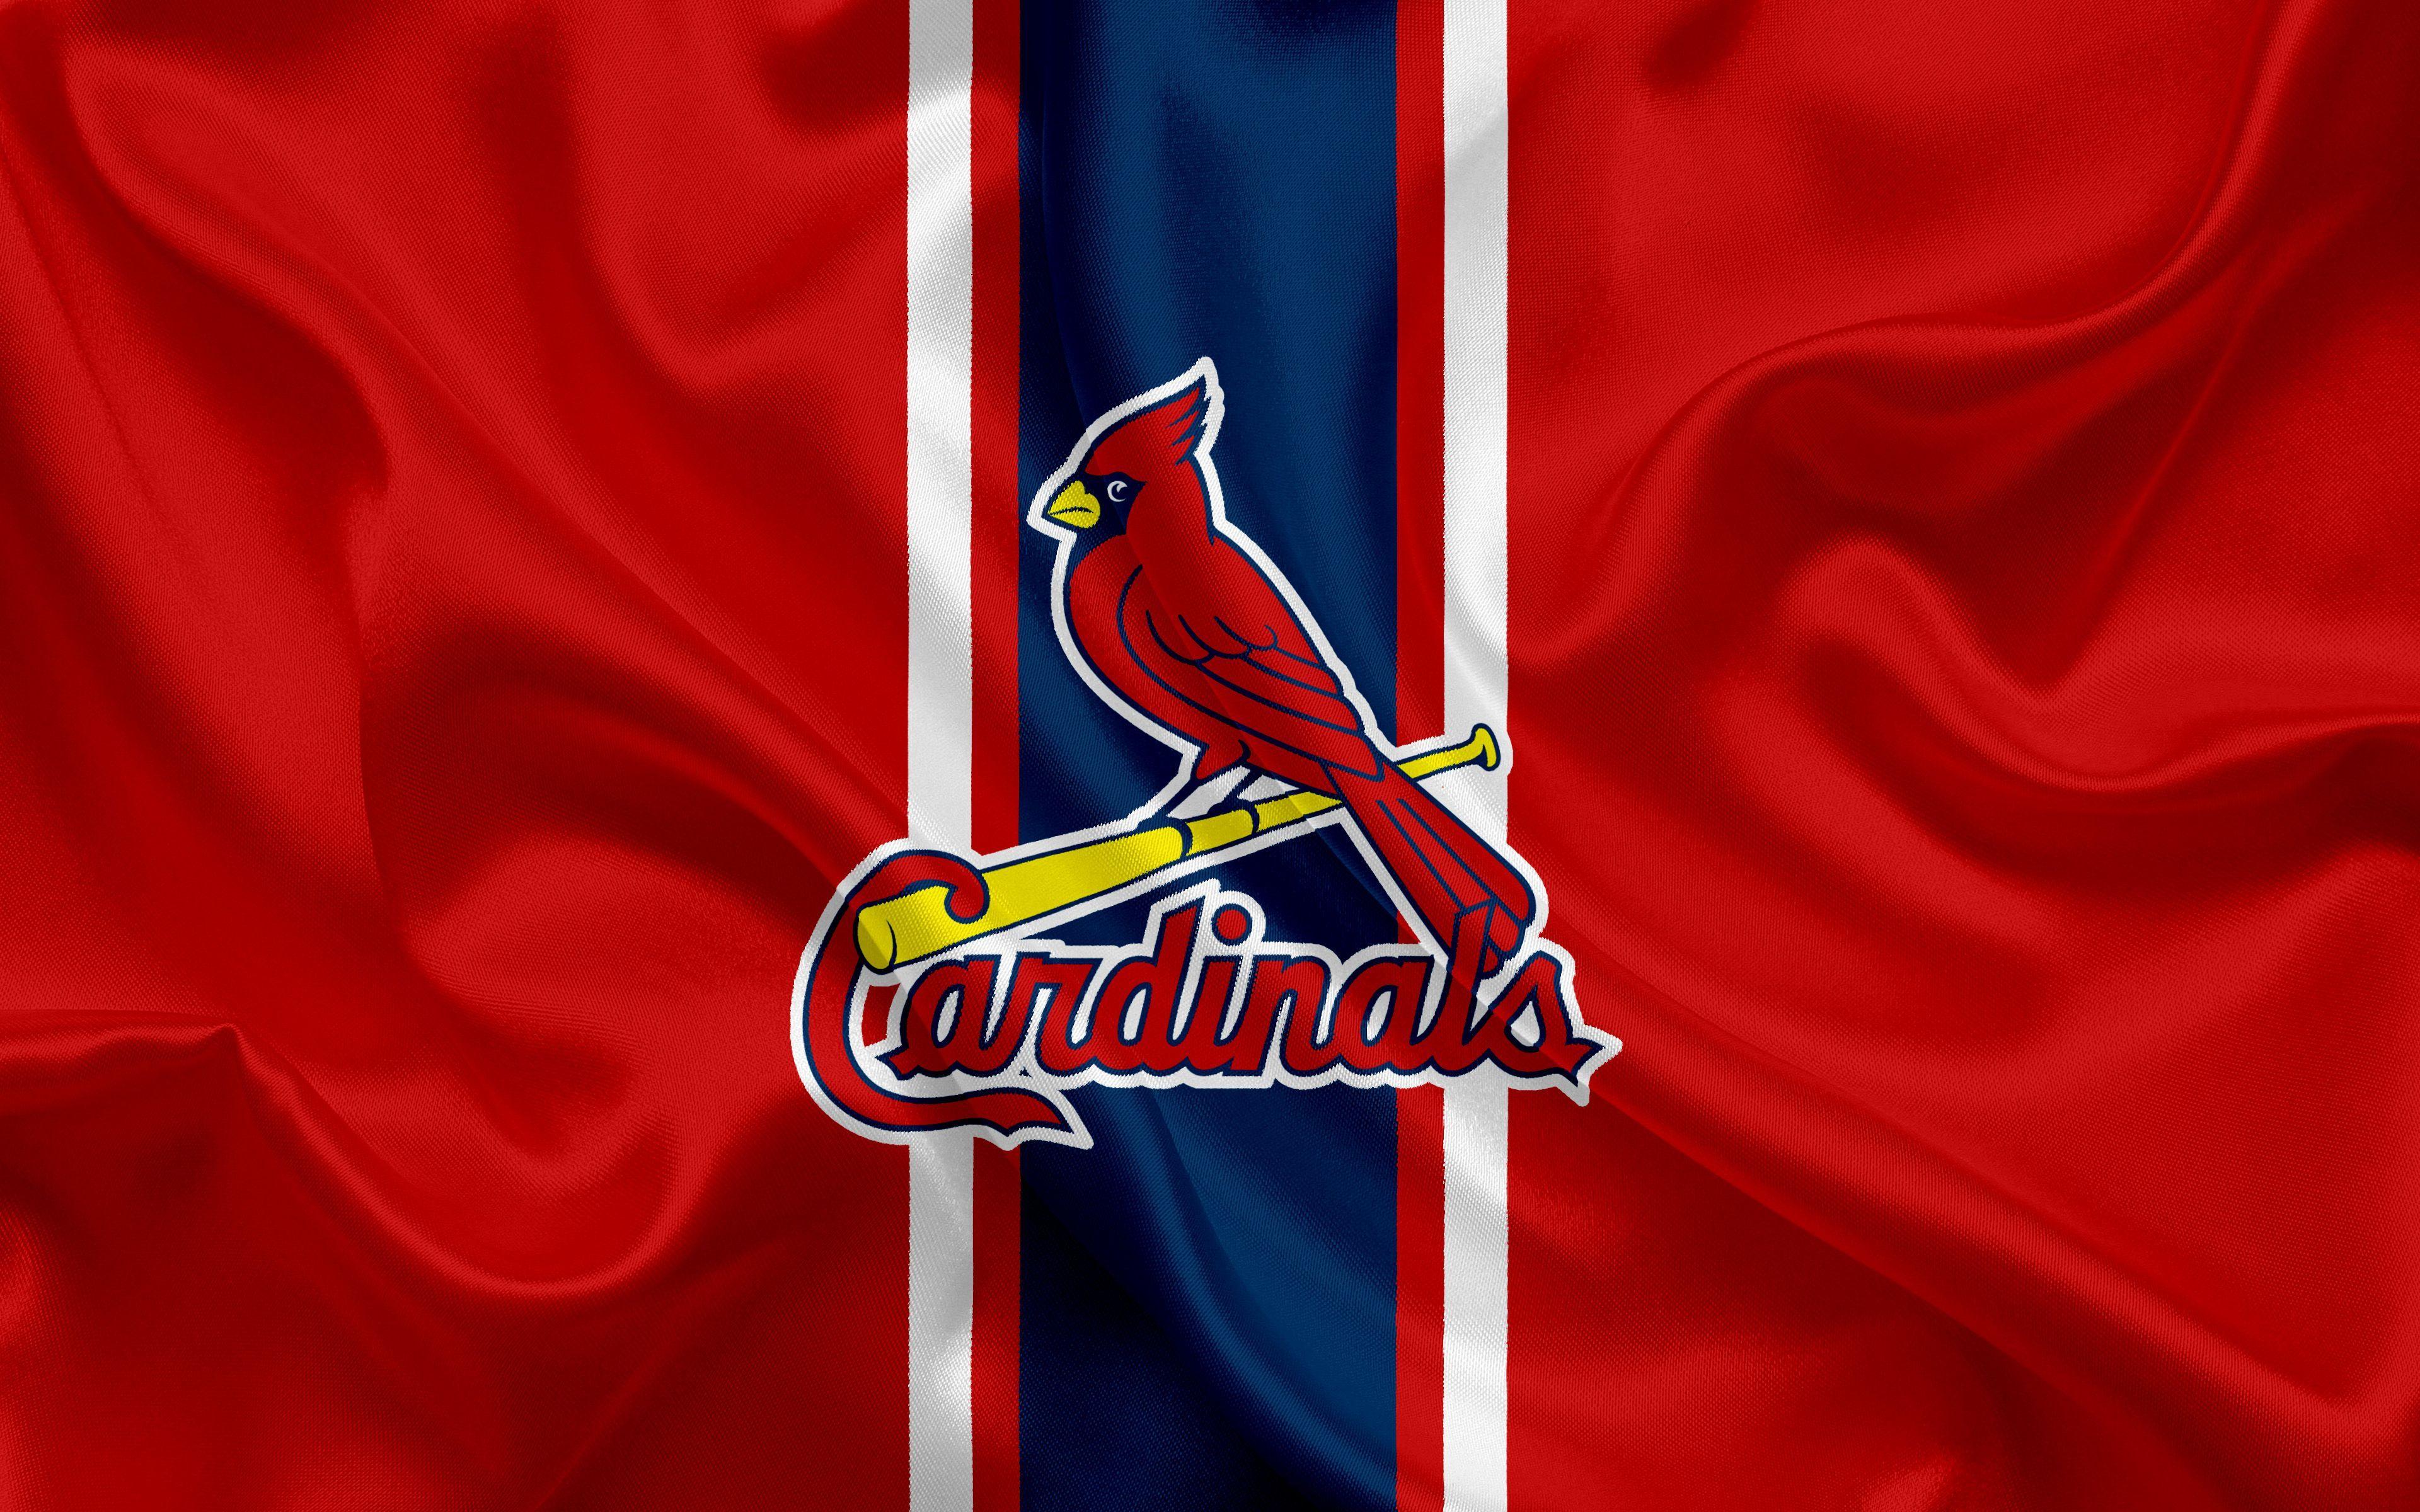 Filename Logo Mlb Baseball St Louis Cardinals Wallpaper And Background Reso In 2020 Cardinals Wallpaper St Louis Cardinals Baseball Baseball Wallpaper